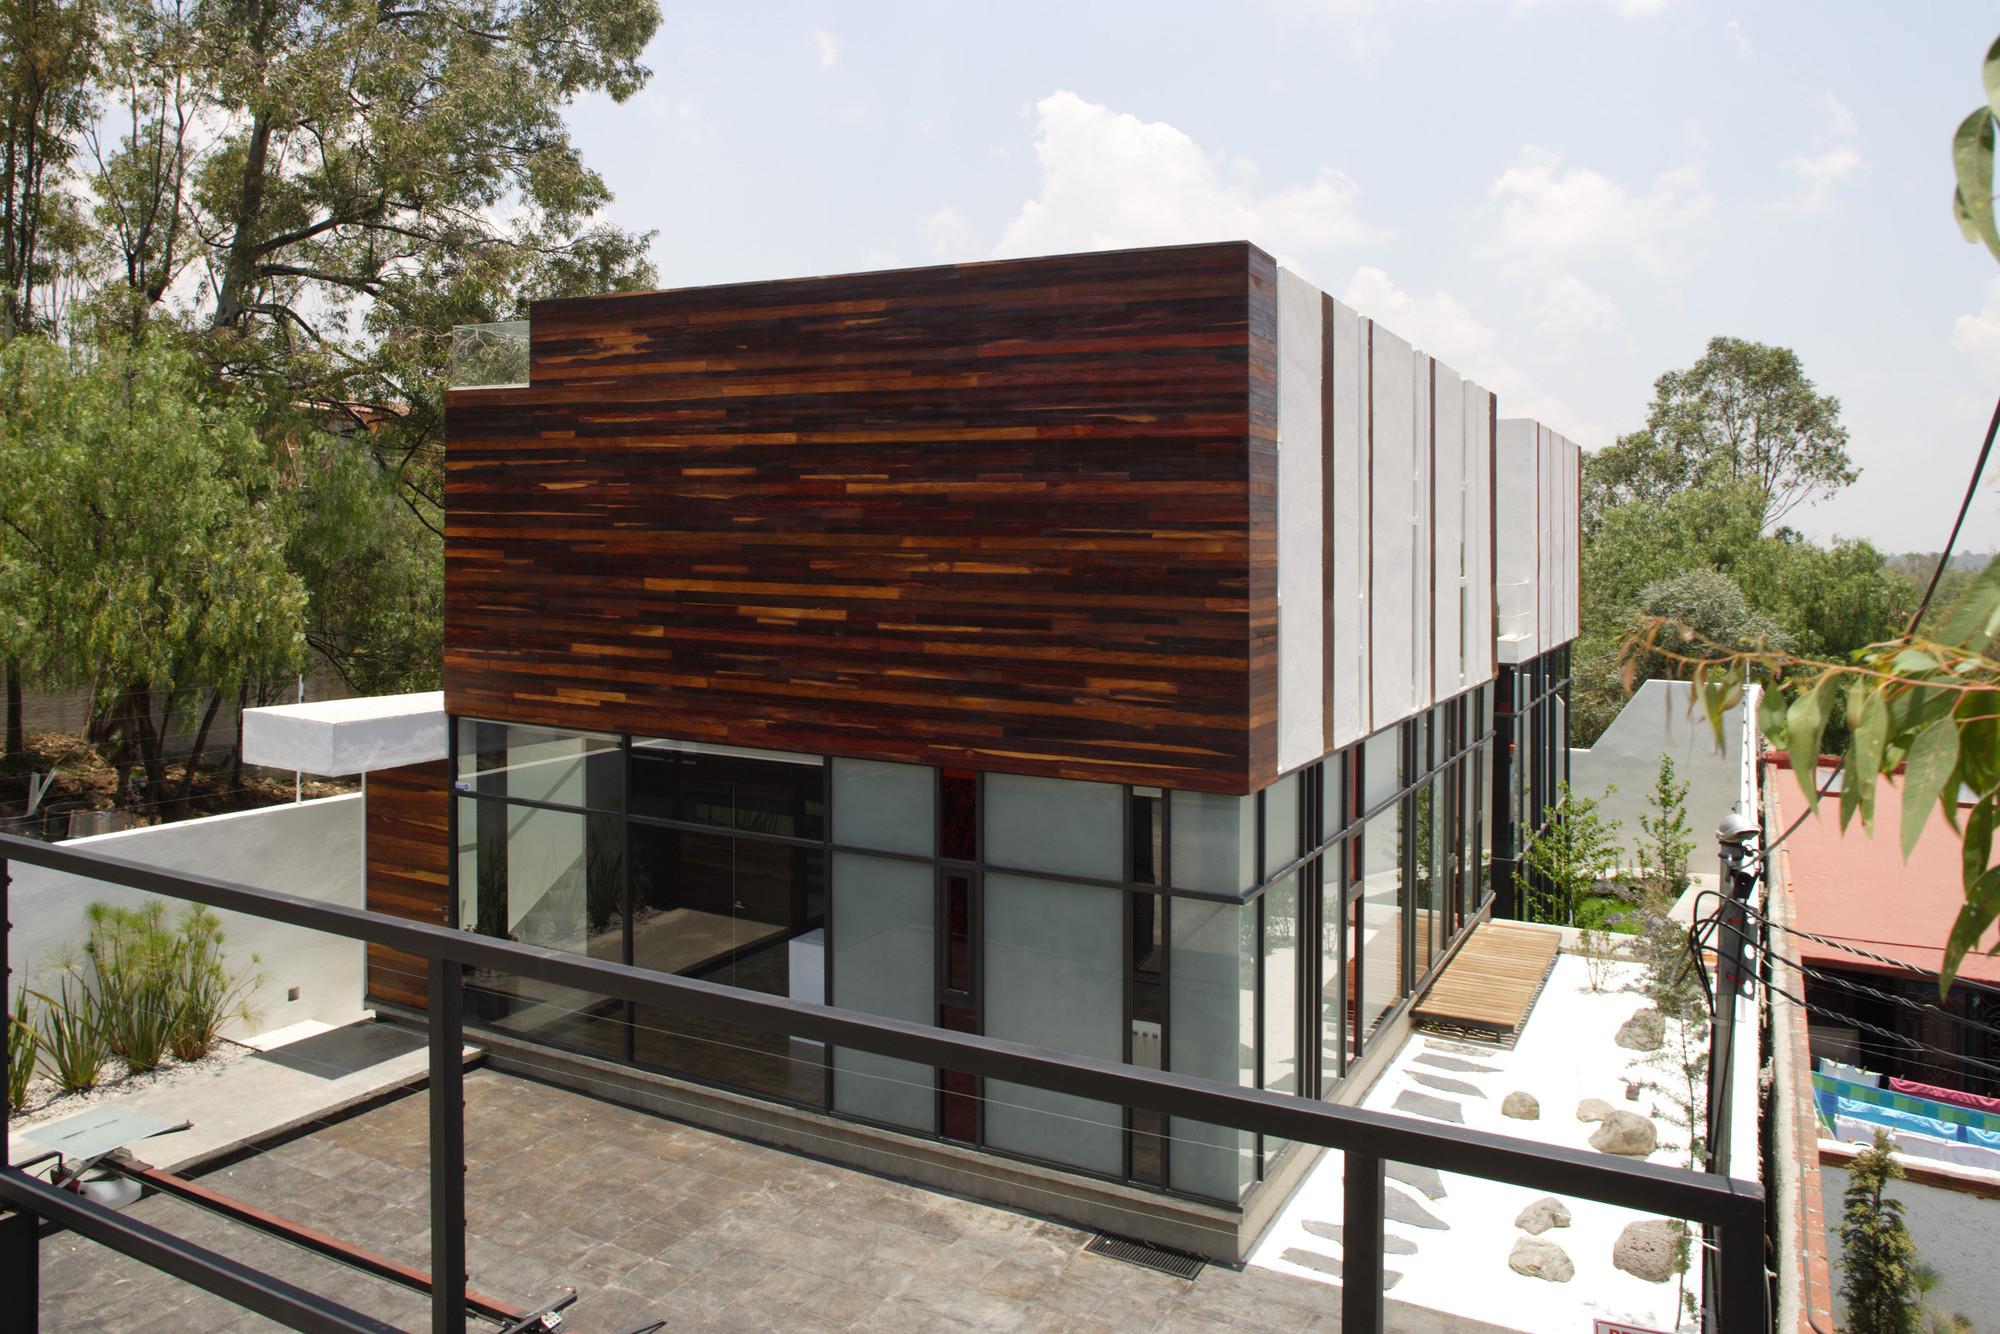 La Casa del Lobo / Darkitectura, © Jorge Taboada